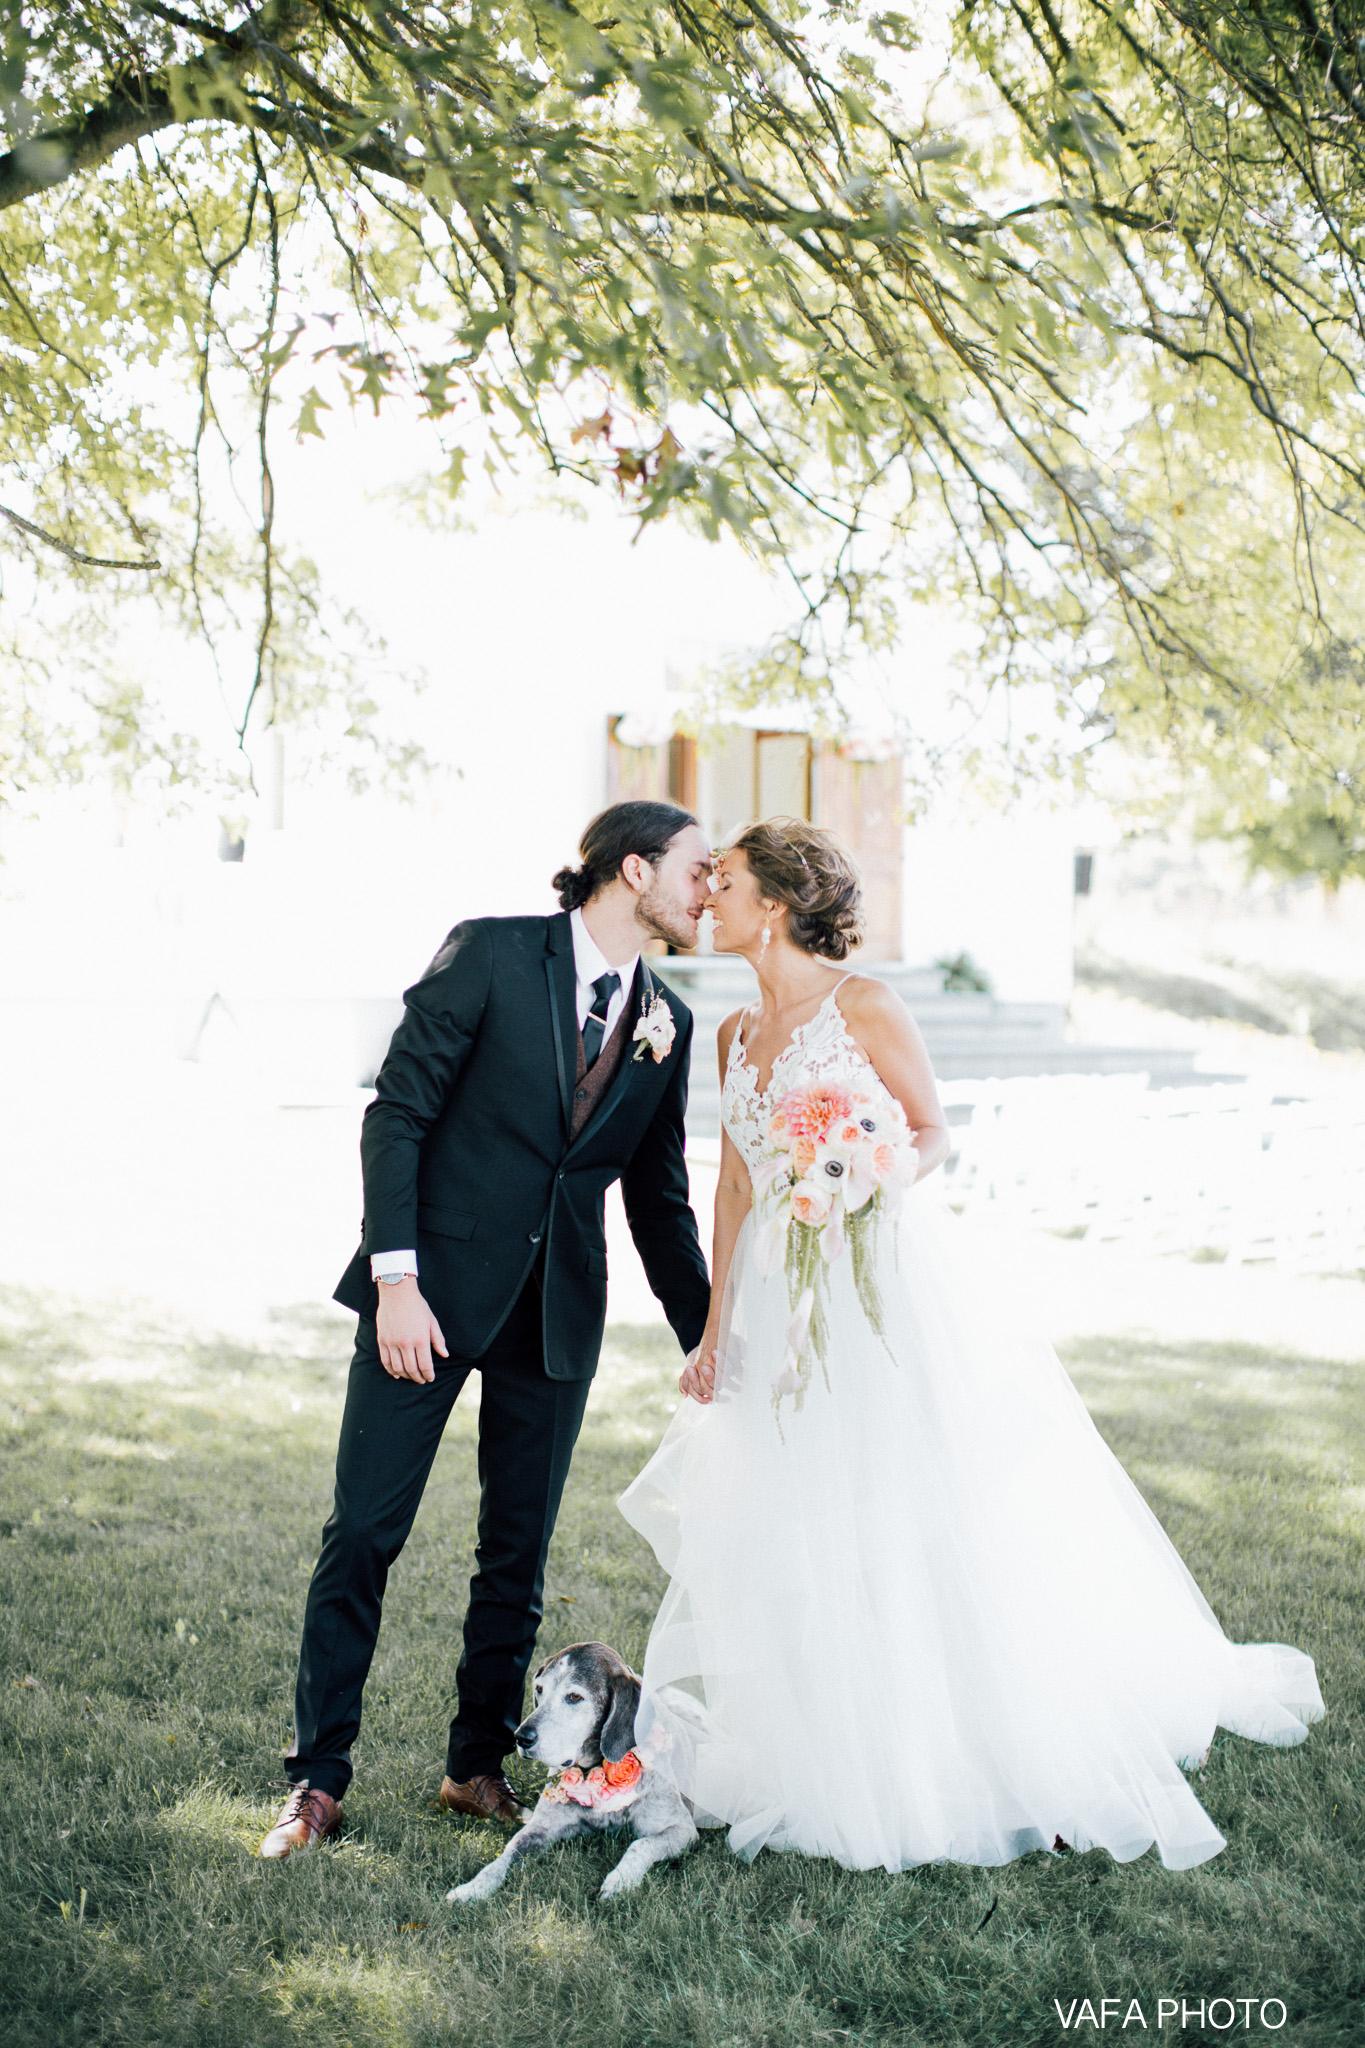 The-Felt-Estate-Wedding-Kailie-David-Vafa-Photo-539.jpg